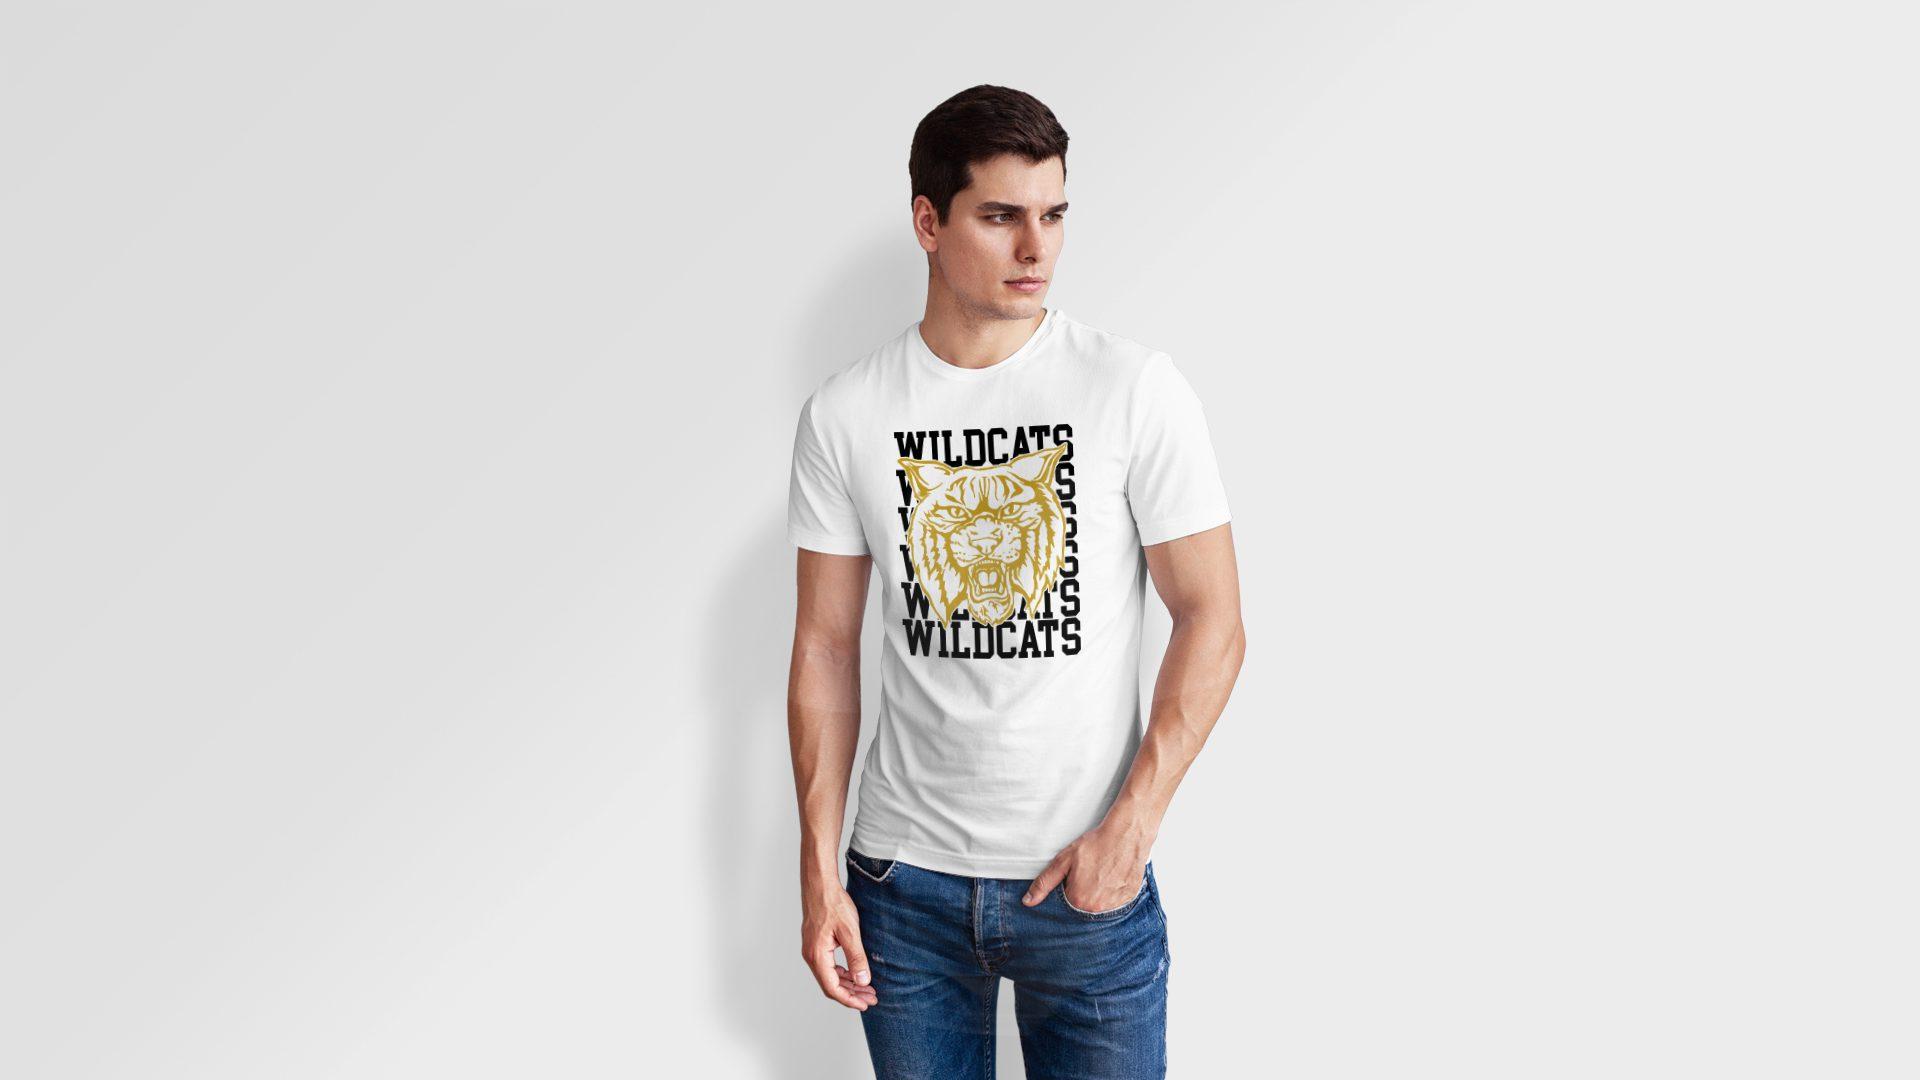 Sew Southern Embroidery - Silkscreen Art Mockup on a shirt (1)